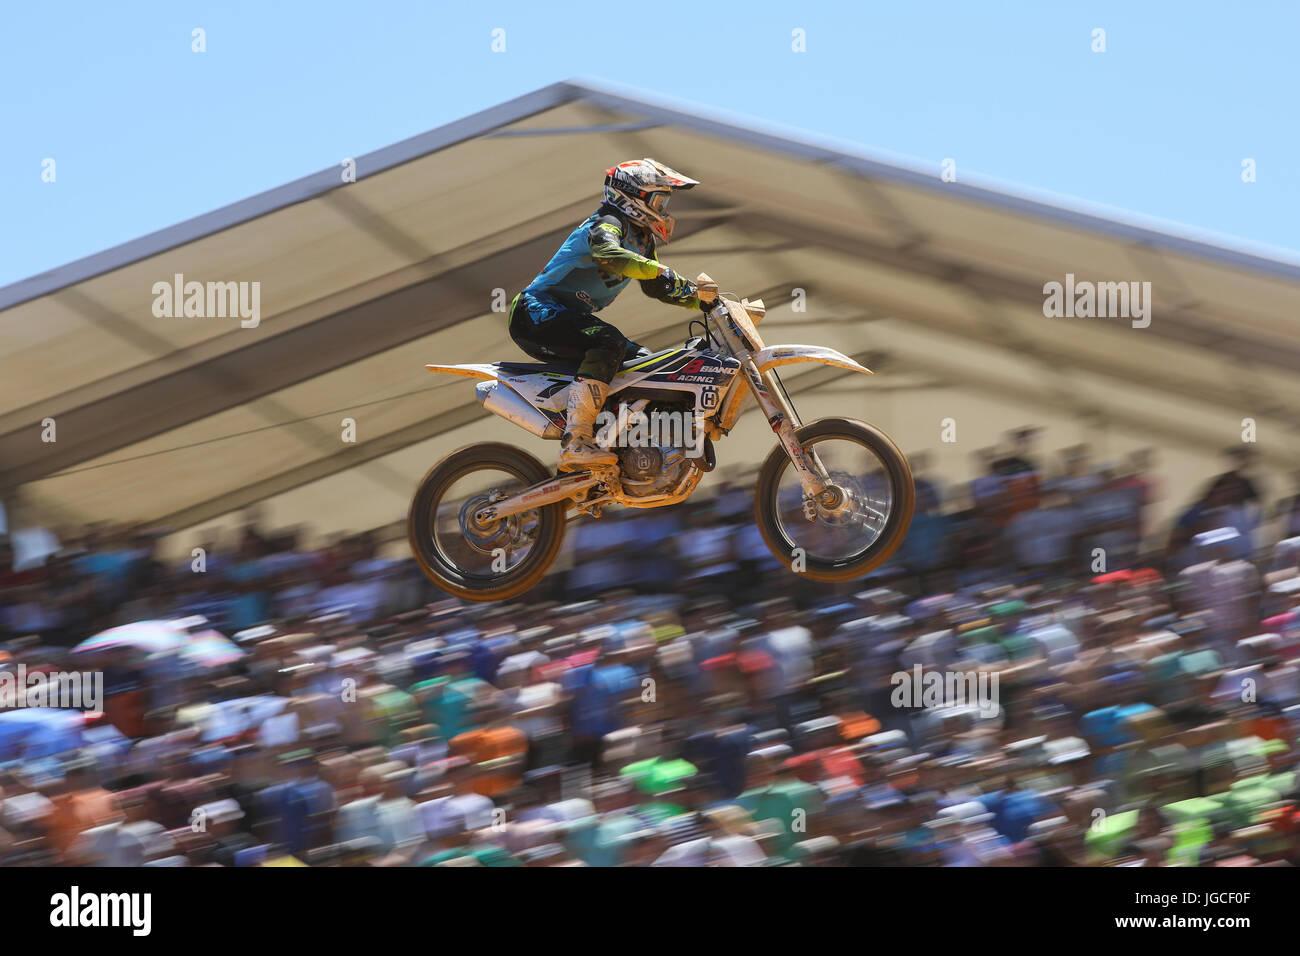 Tanel Leok #7 (EST) in Husqvarna of 8Biano Racing Husqvarna in action during the MXGP World Championship 2017 Race - Stock Image